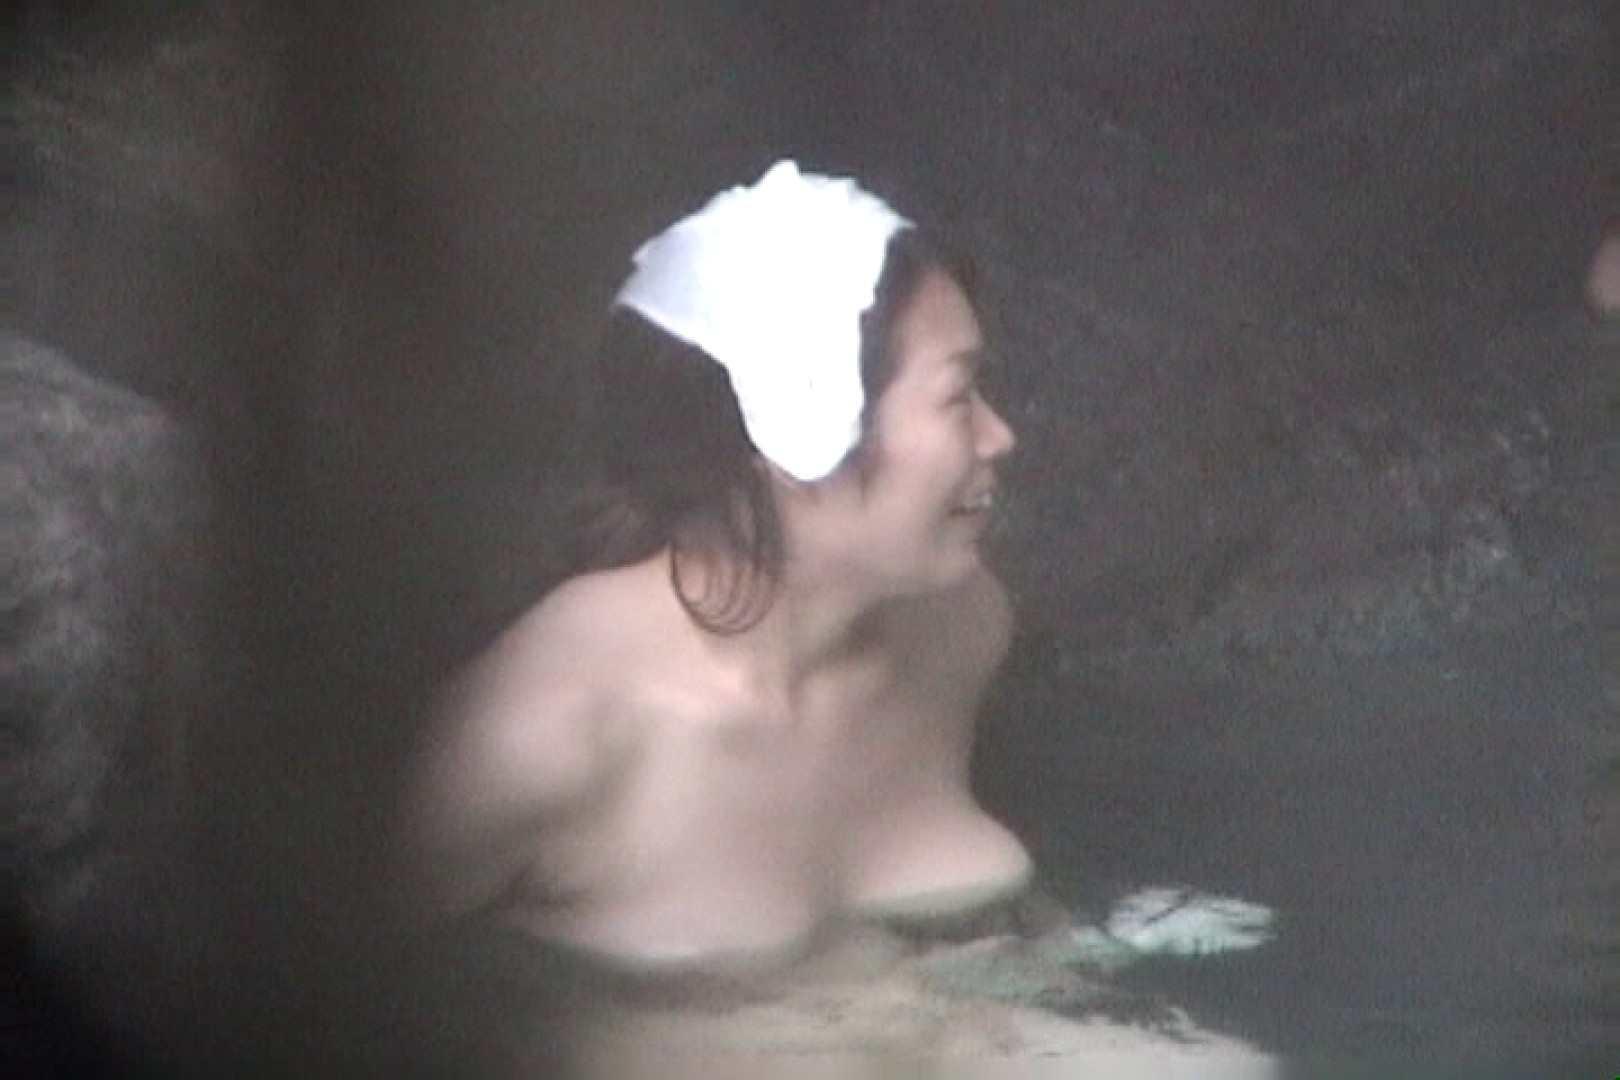 Aquaな露天風呂Vol.71【VIP限定】 ガールの盗撮 オメコ動画キャプチャ 74枚